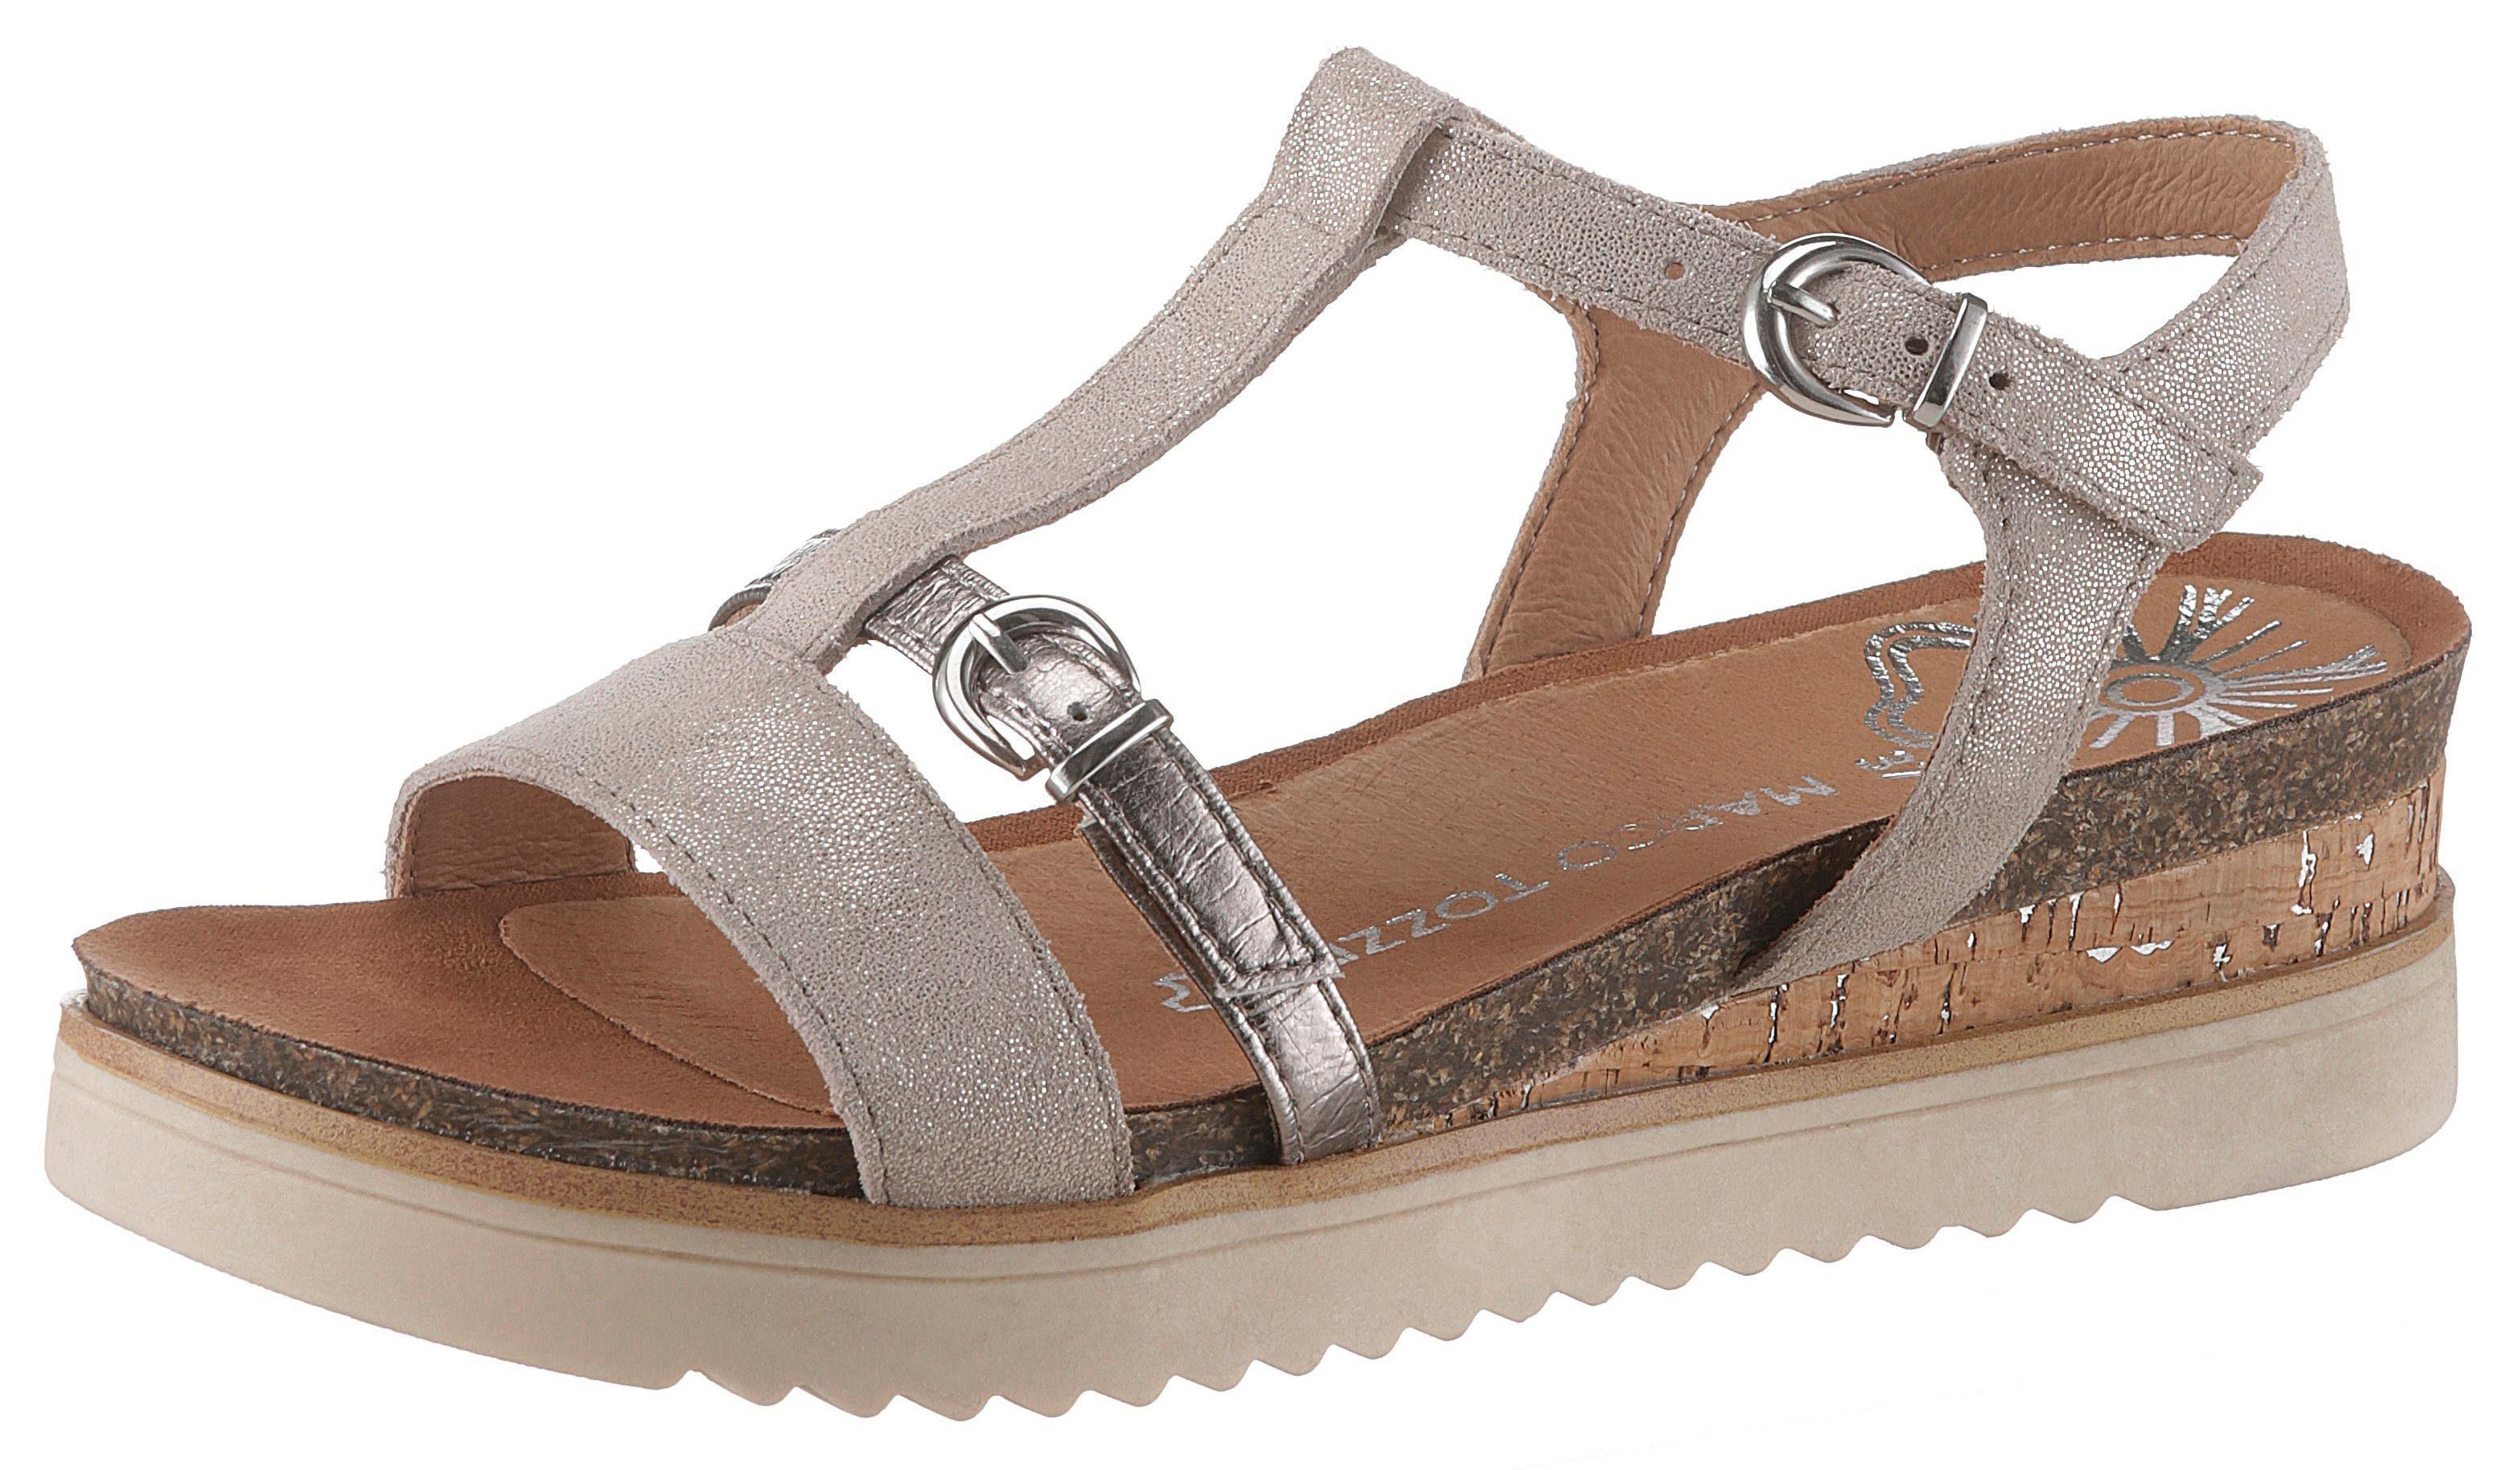 MARCO TOZZI Sandalette mit Metallicdetails kaufen | OTTO